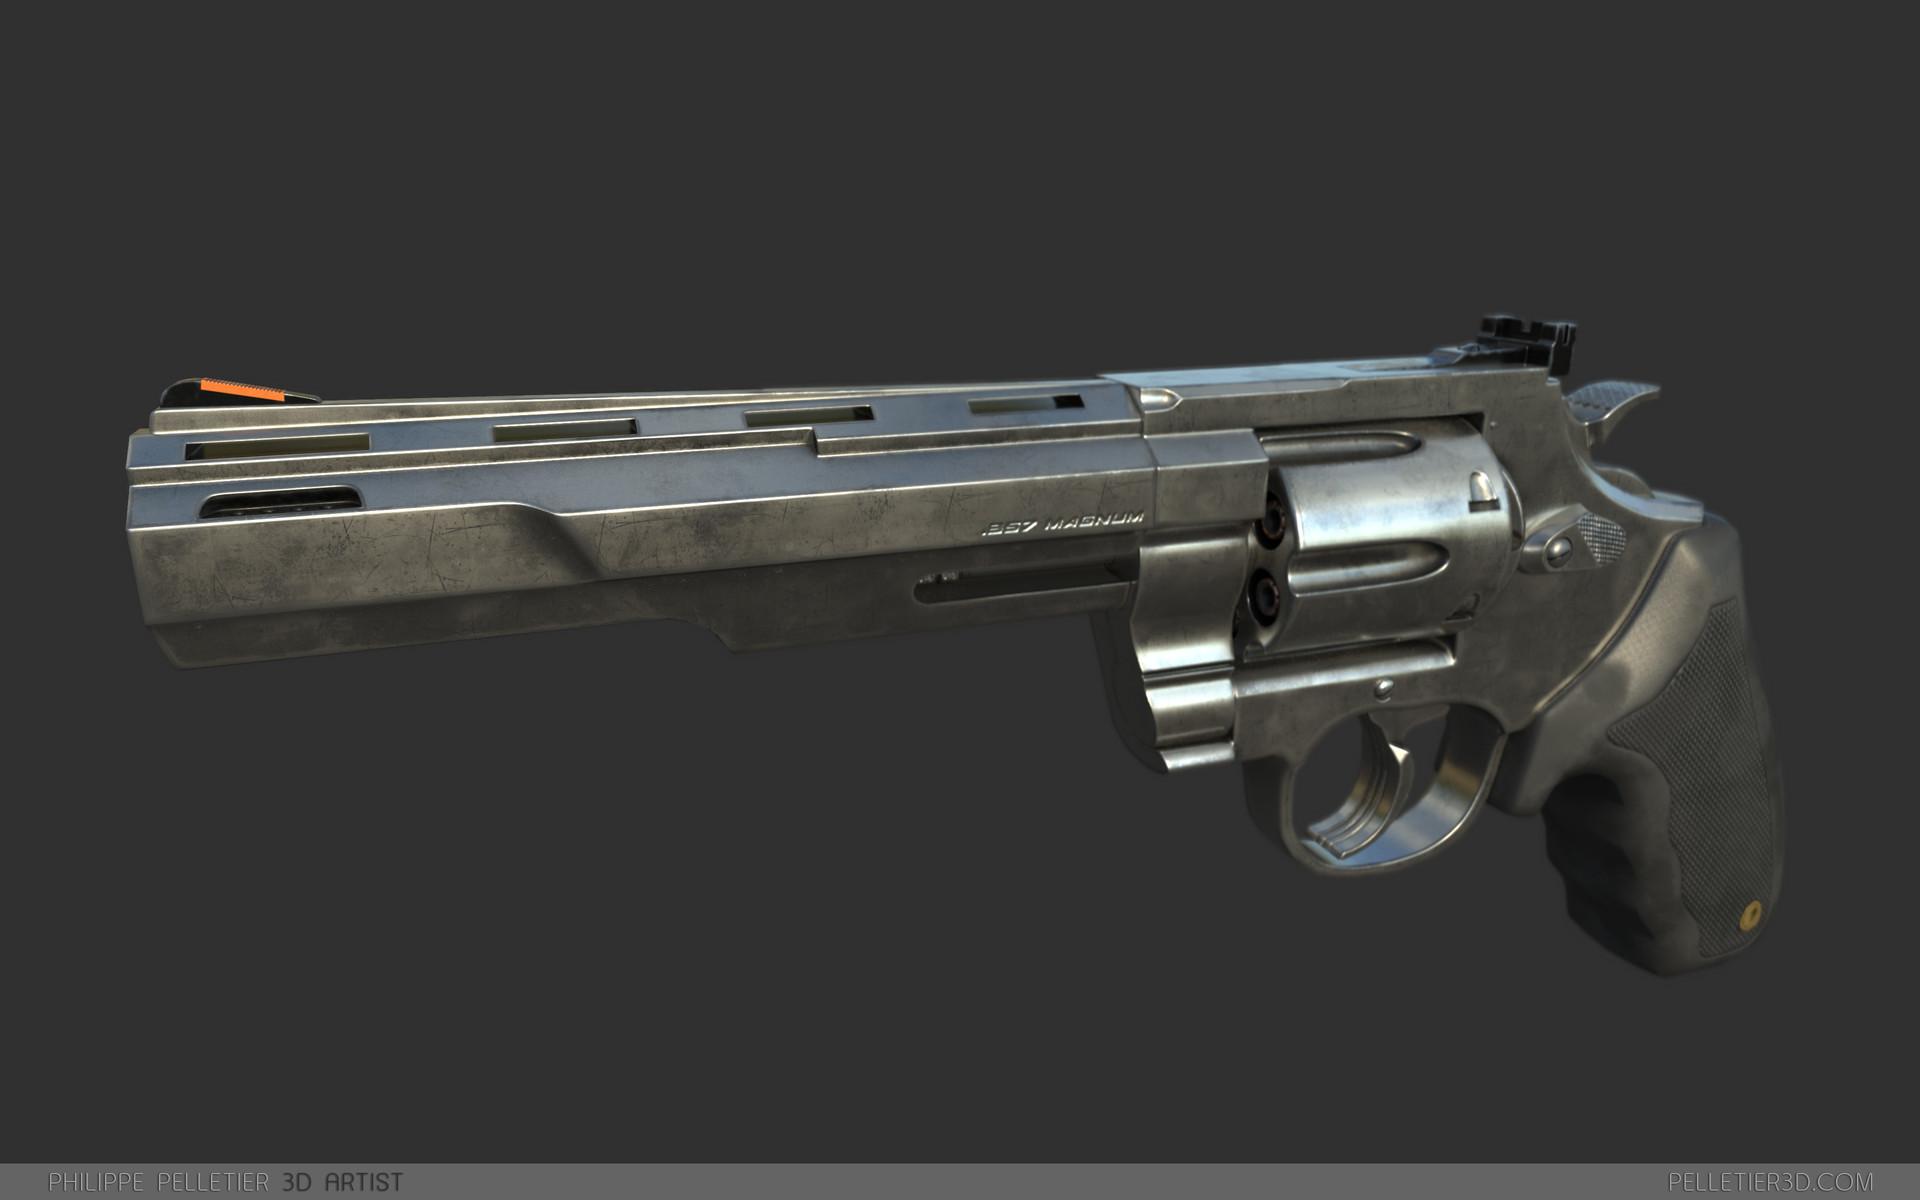 Philippe pelletier revolver 002